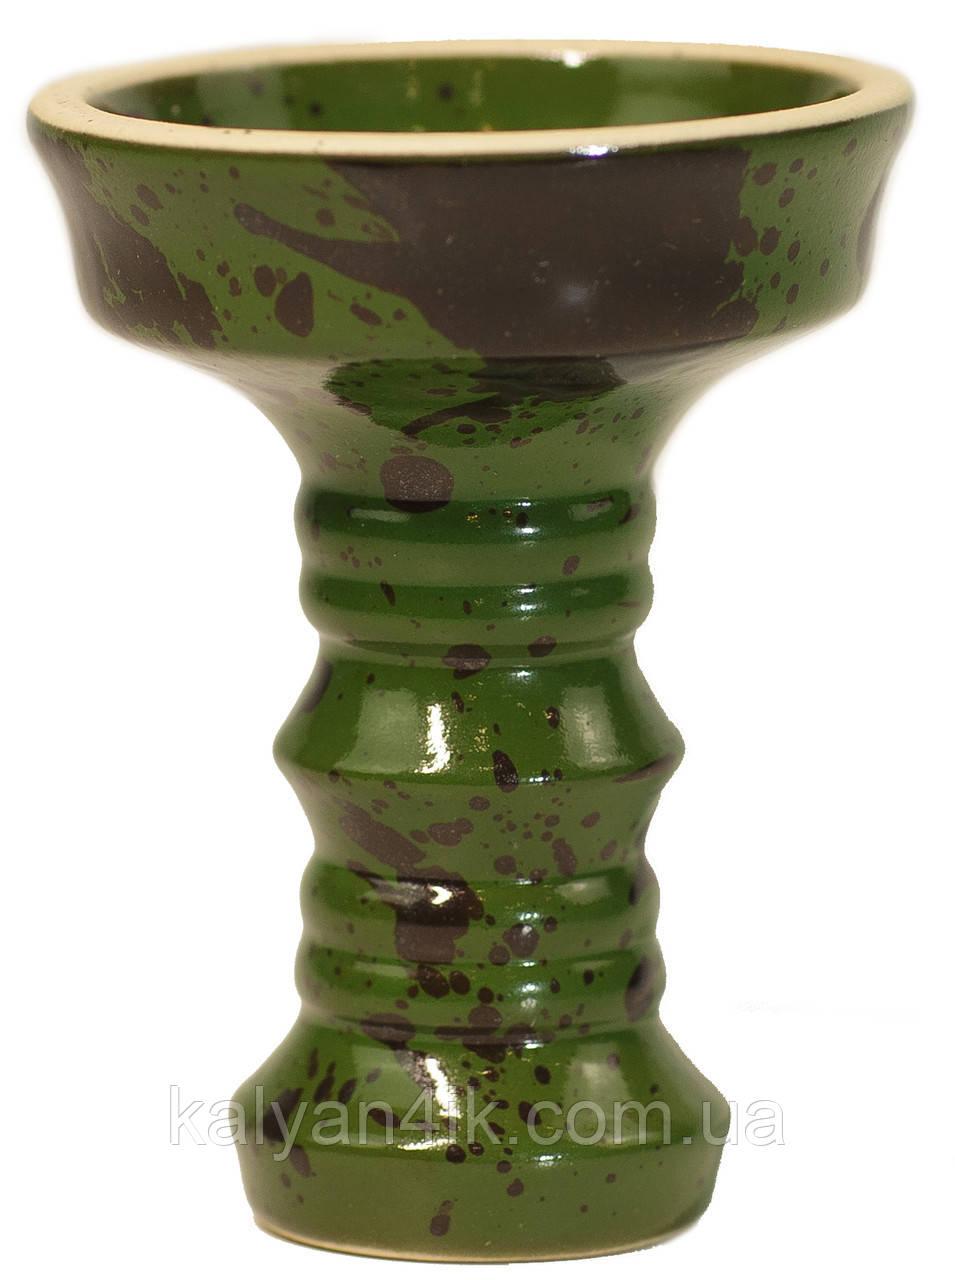 Чаша Fog Sakura Full-Glazed Зеленый с черным